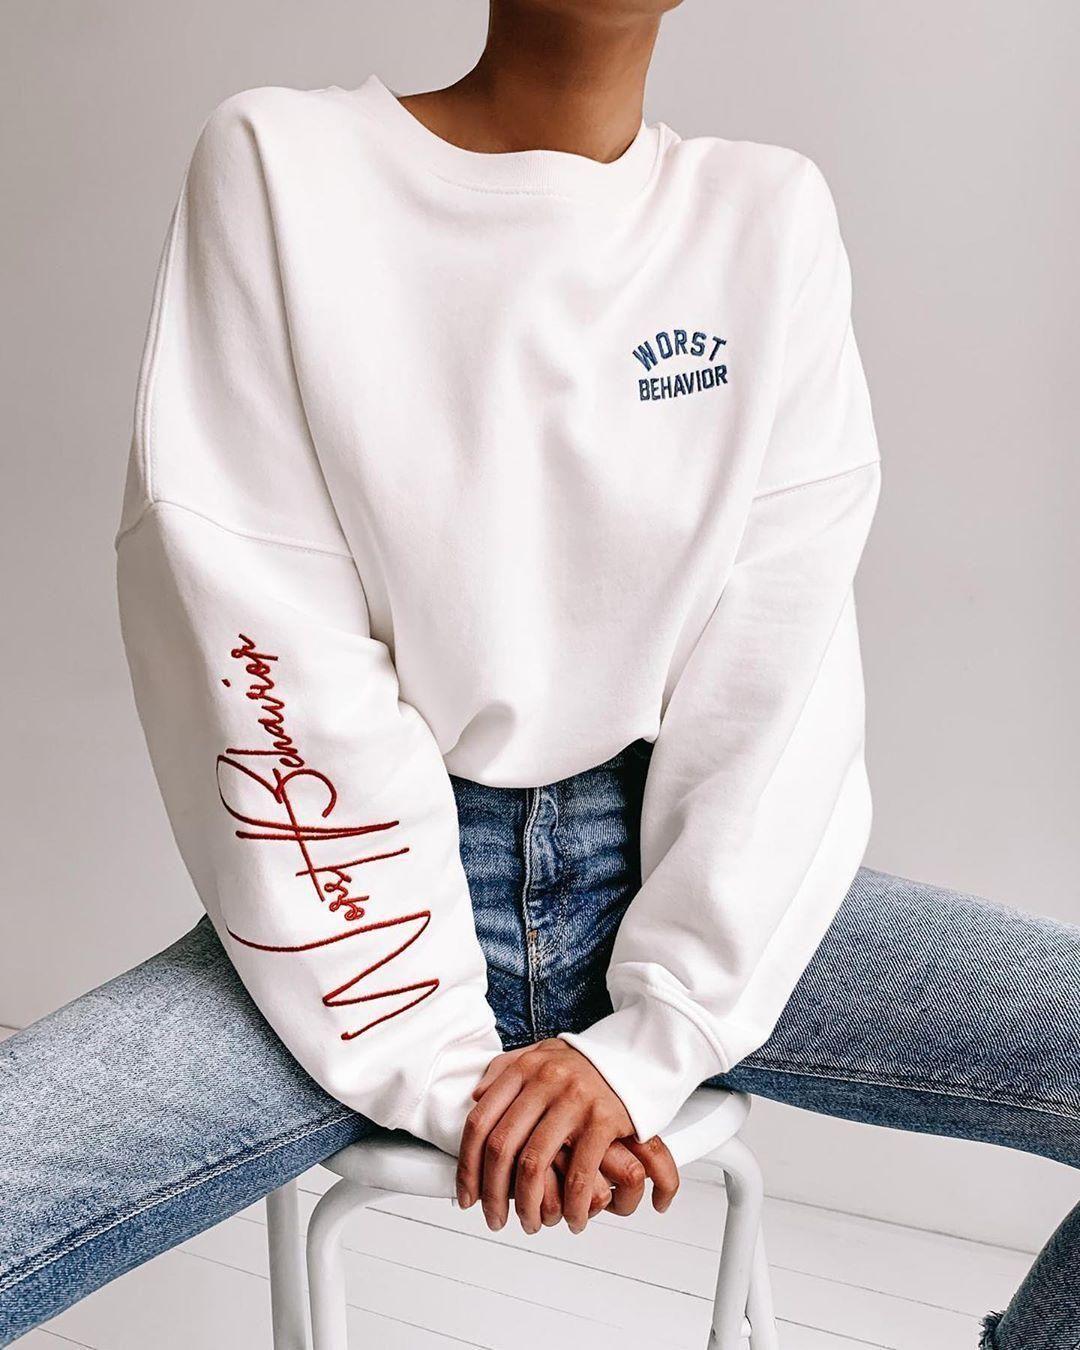 Sweater 80 At Worst Behavior Com Wheretoget Shirt Design Inspiration Fashion Hoodie Design [ 1350 x 1080 Pixel ]